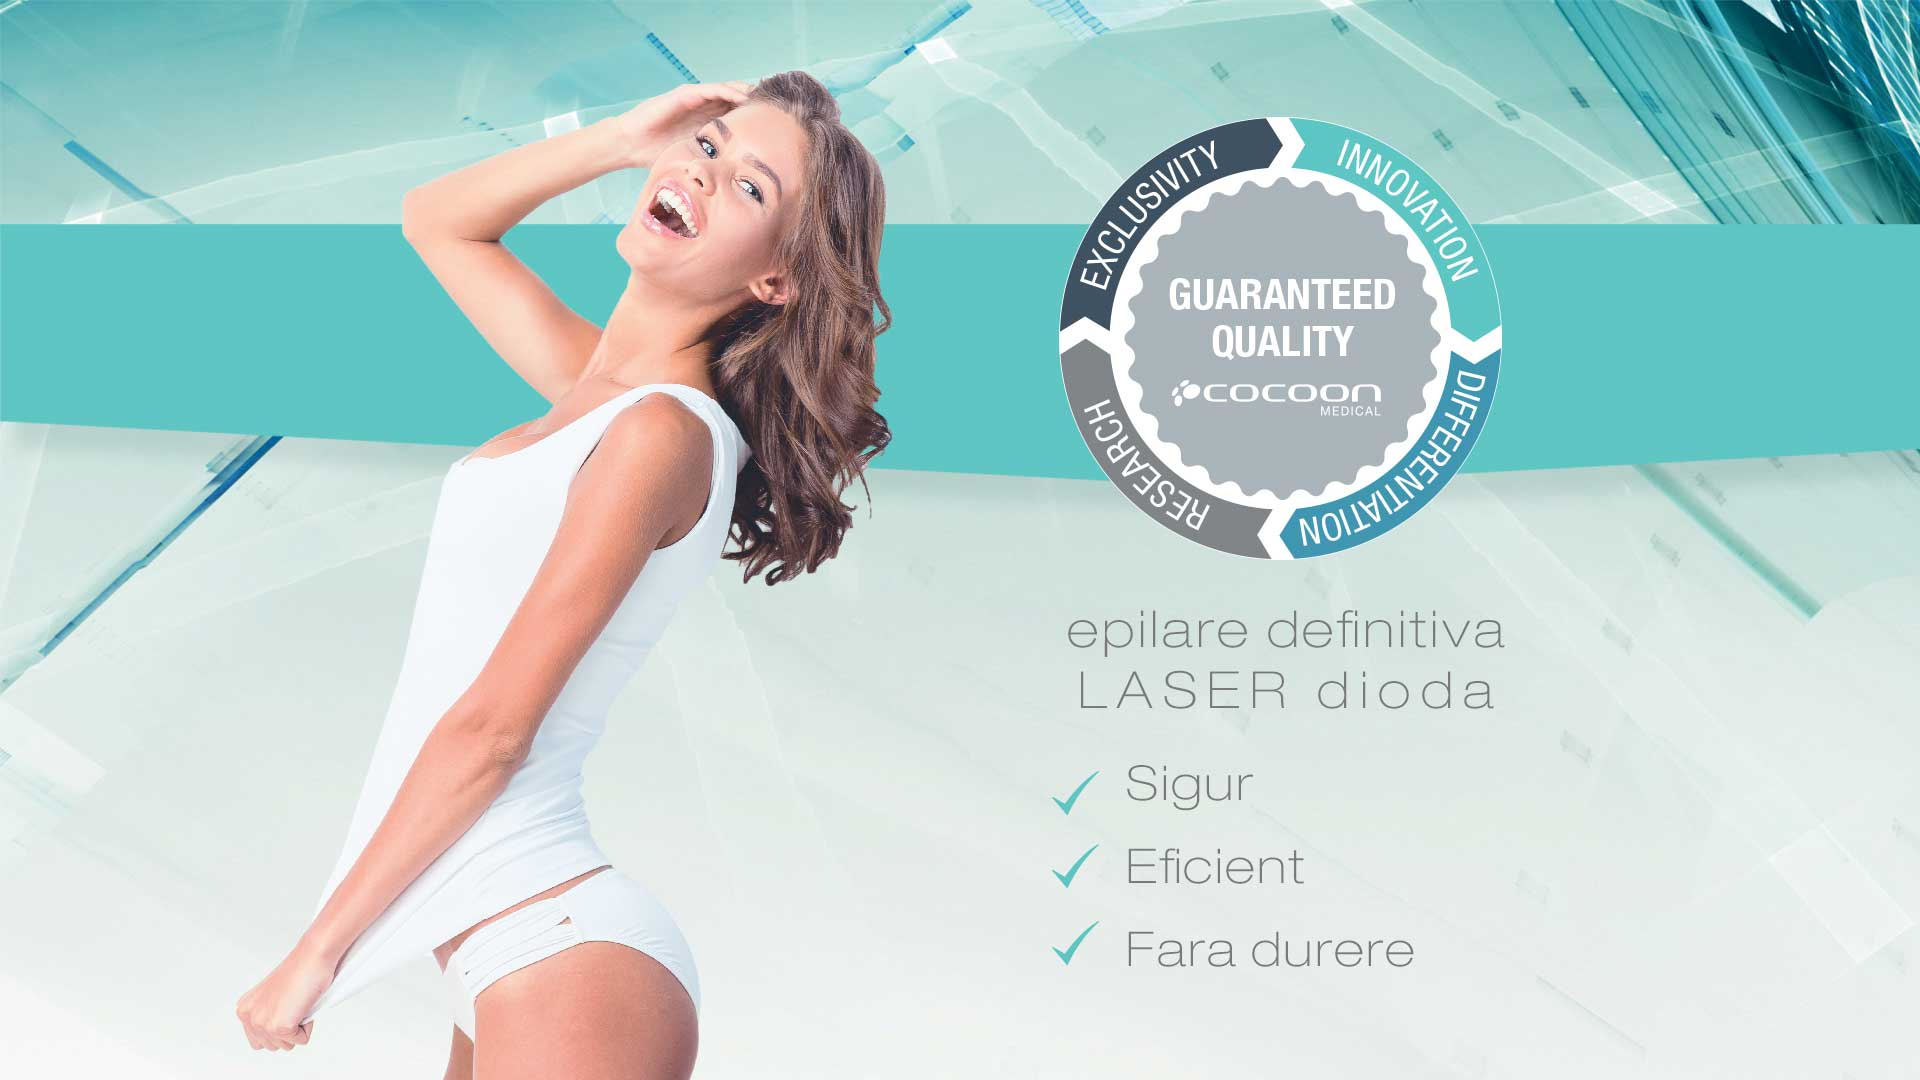 epilare definitiva cu laser craiova